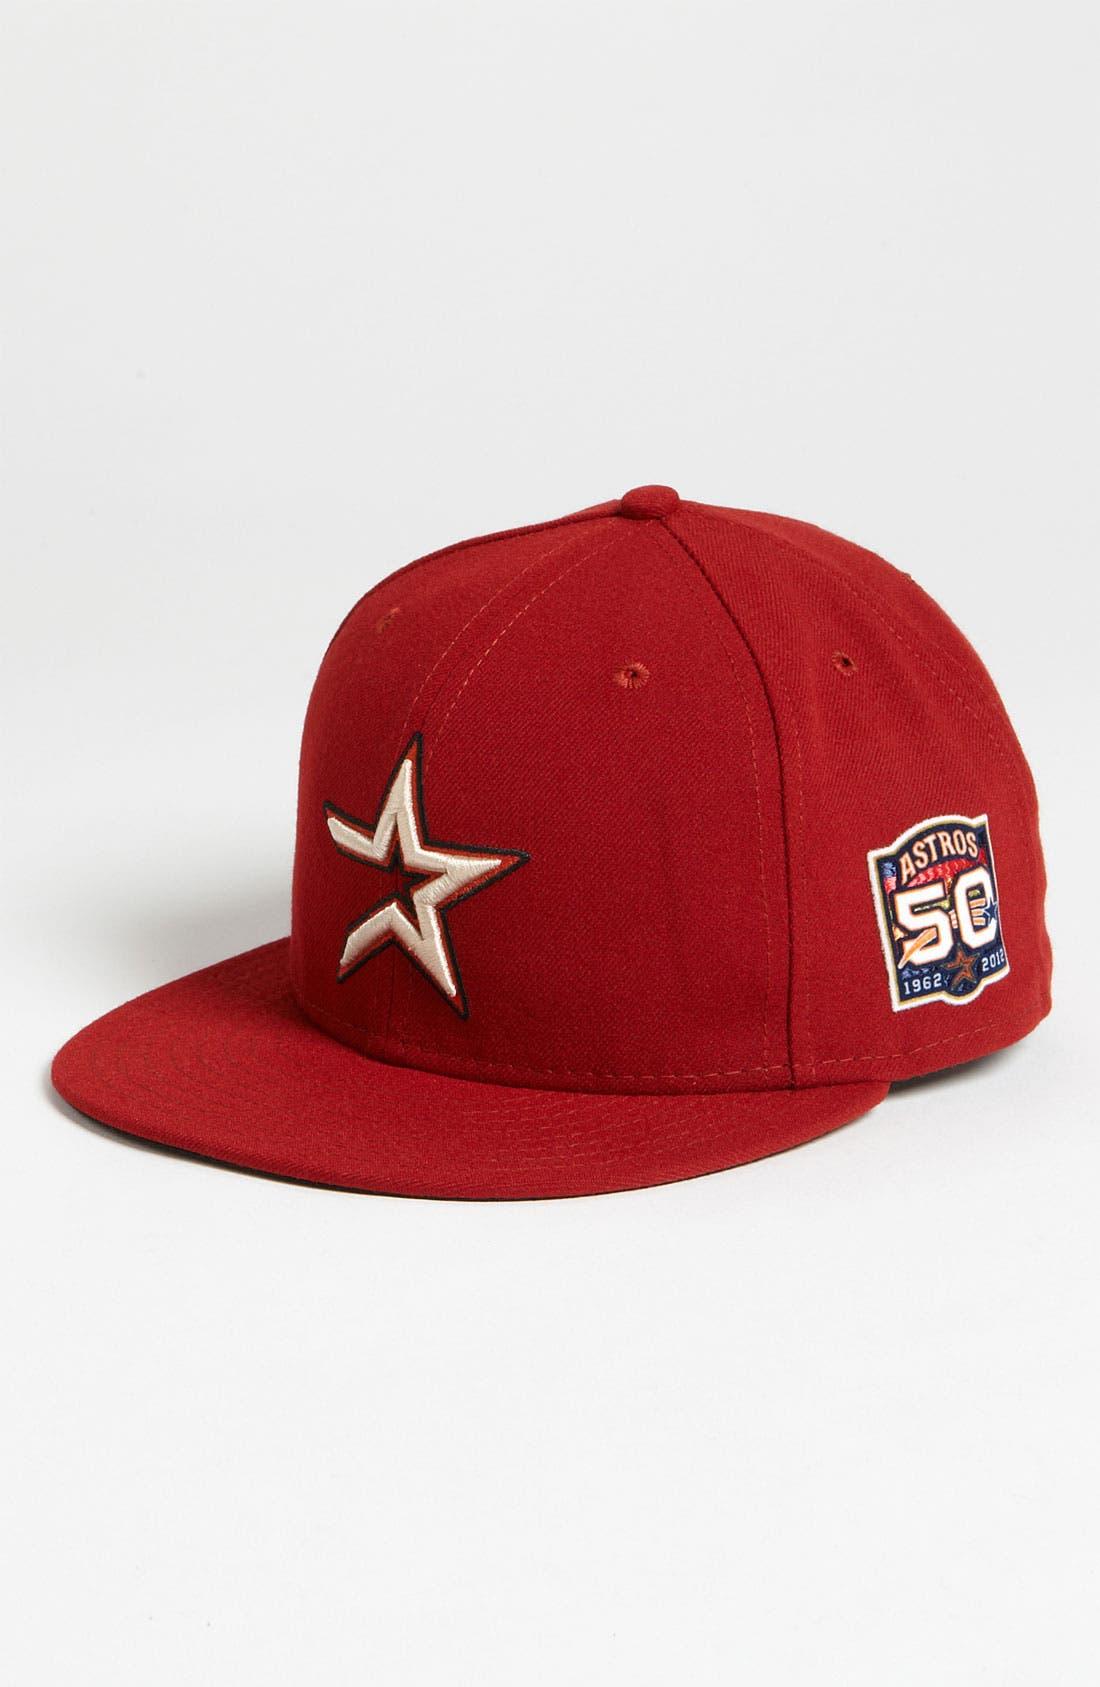 Alternate Image 1 Selected - New Era Cap 'Houston Astros' Baseball Cap